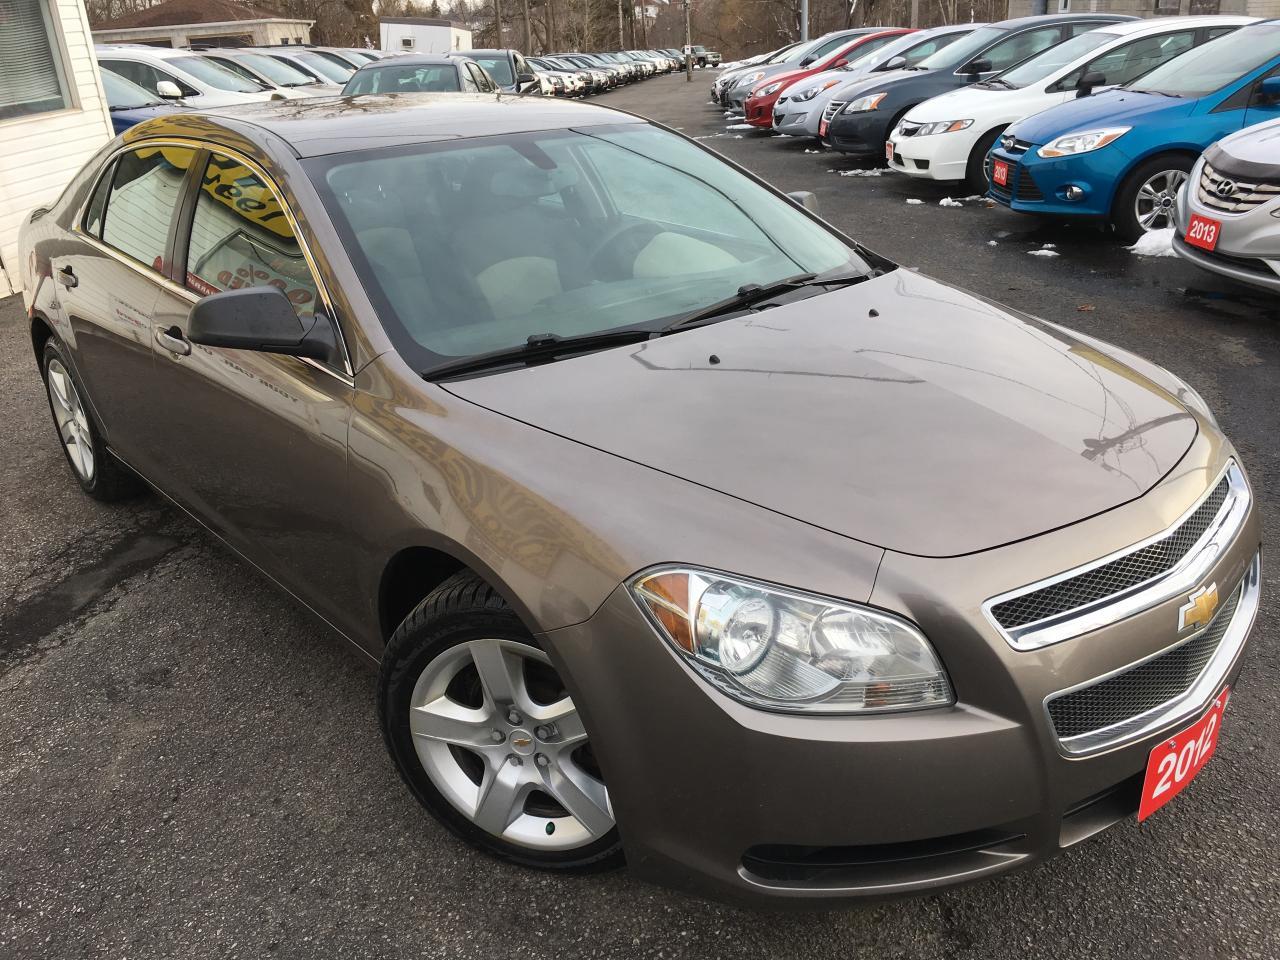 2012 Chevrolet Malibu LS / AUTO / LOADED / VERY CLEAN / LIKE NEW!!!